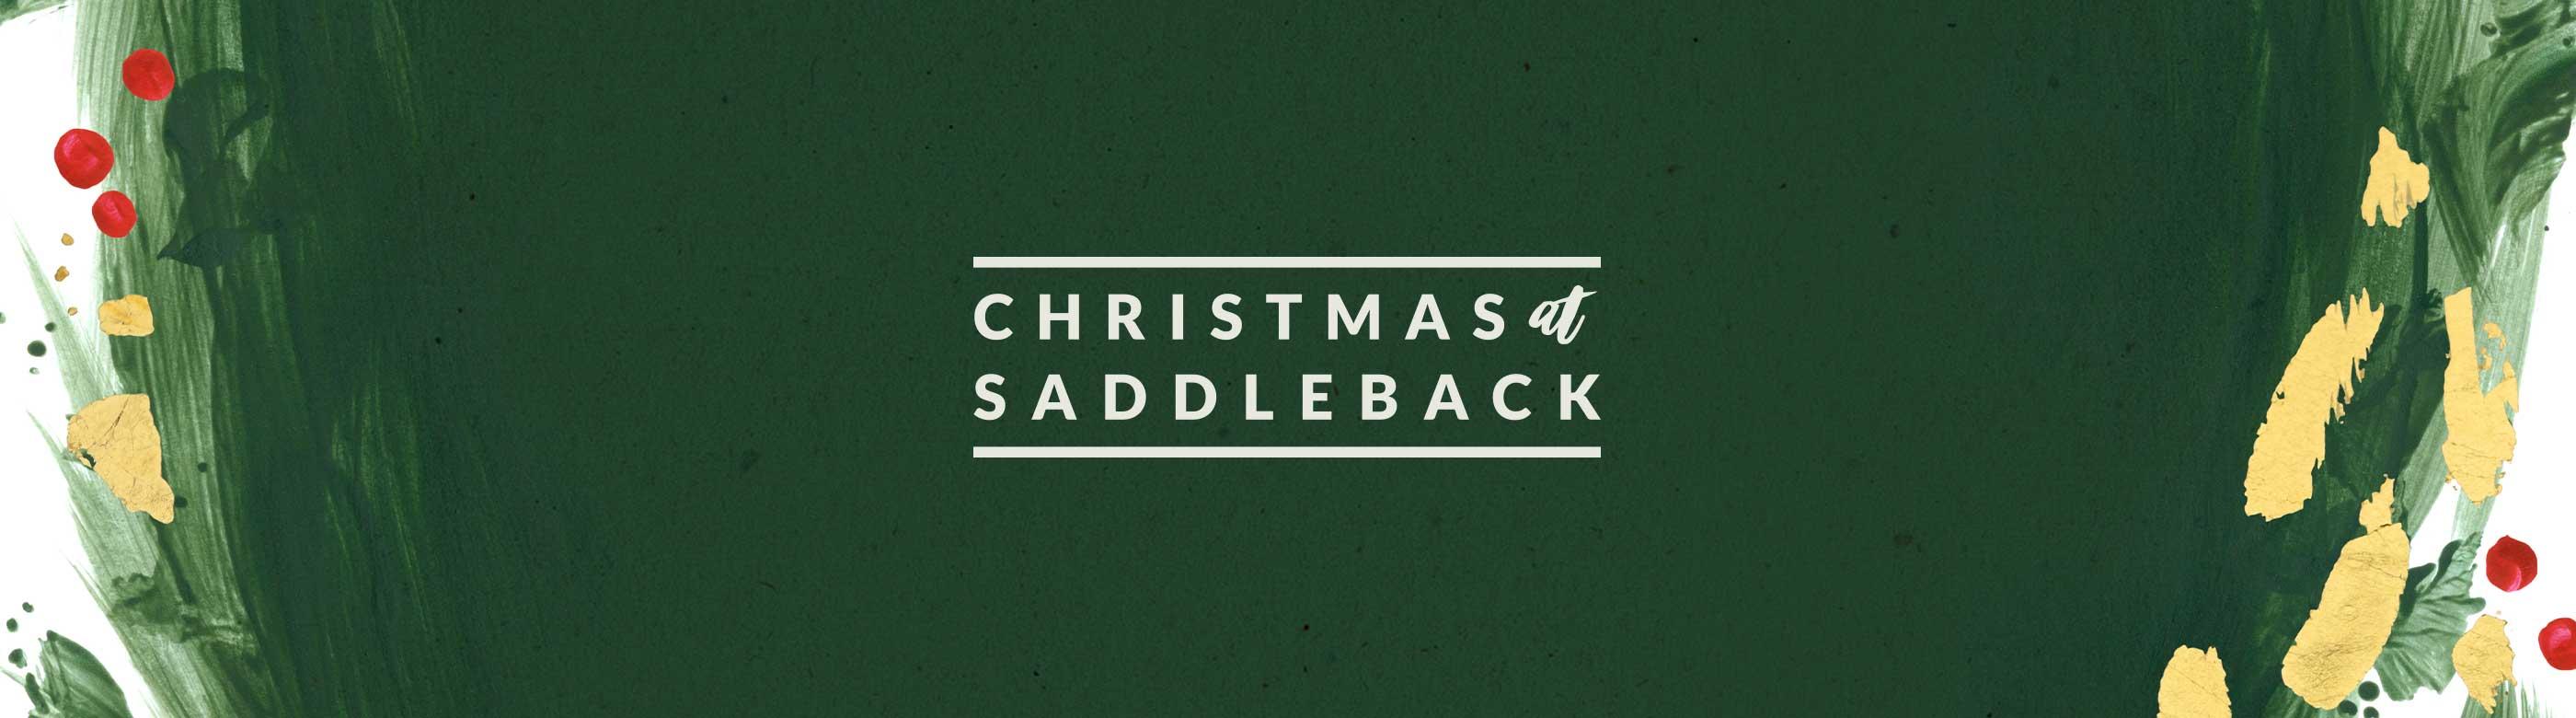 Saddleback Church 2020 Christmas Services Saddleback Church: Events: Christmas Day Service at 11:00 AM